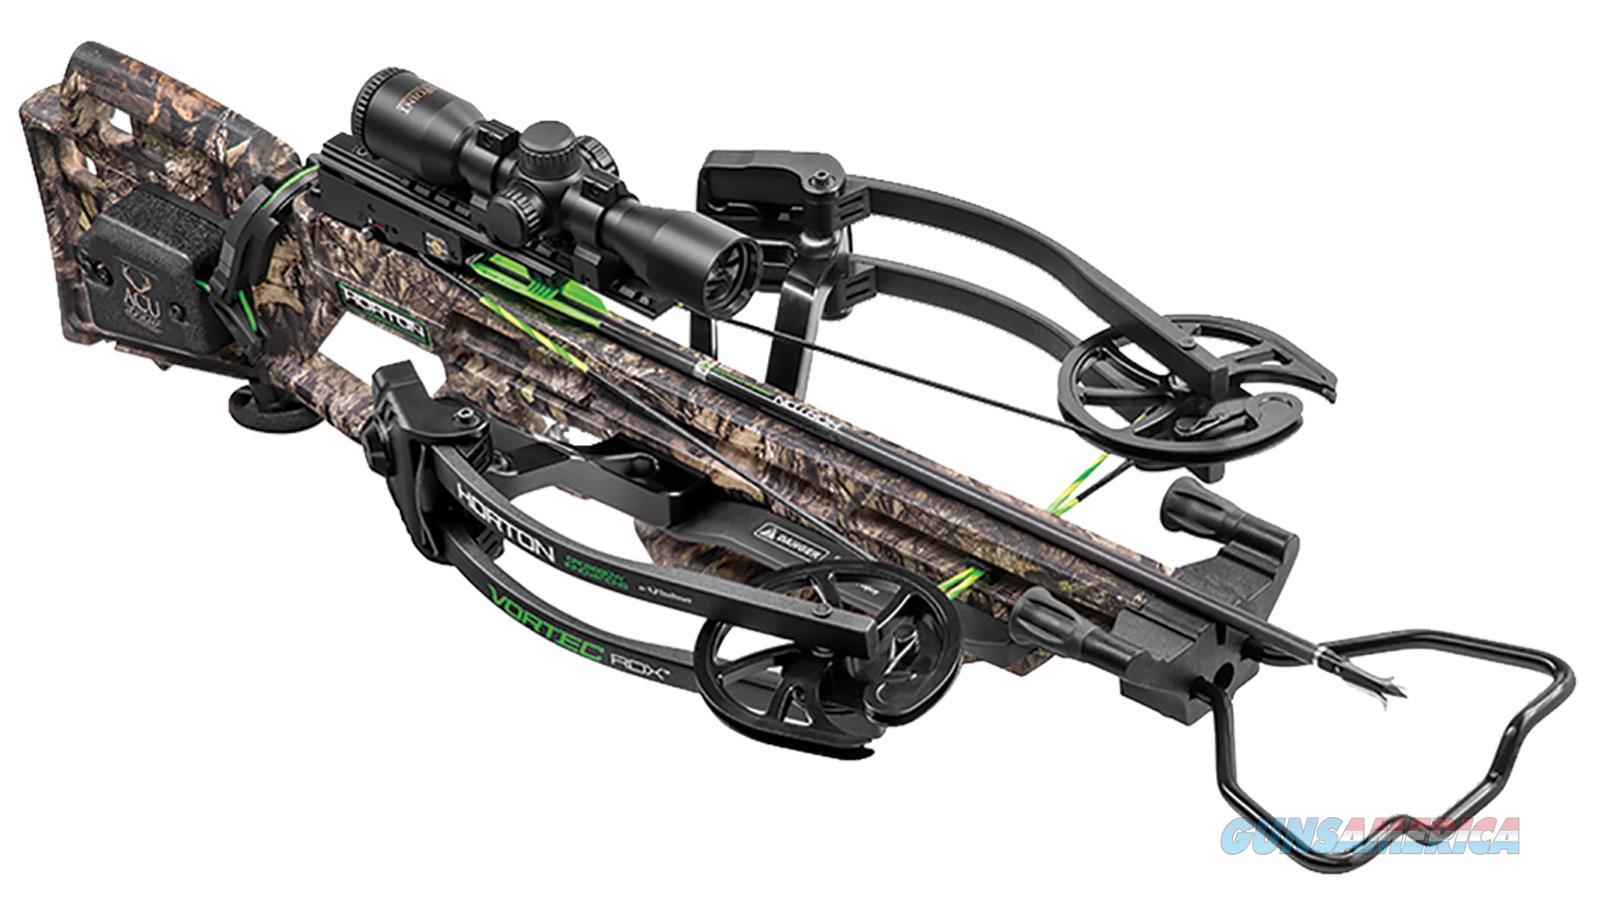 Horton Horton Vortec Rdx Package NH17060-5522  Non-Guns > Archery > Bows > Crossbows